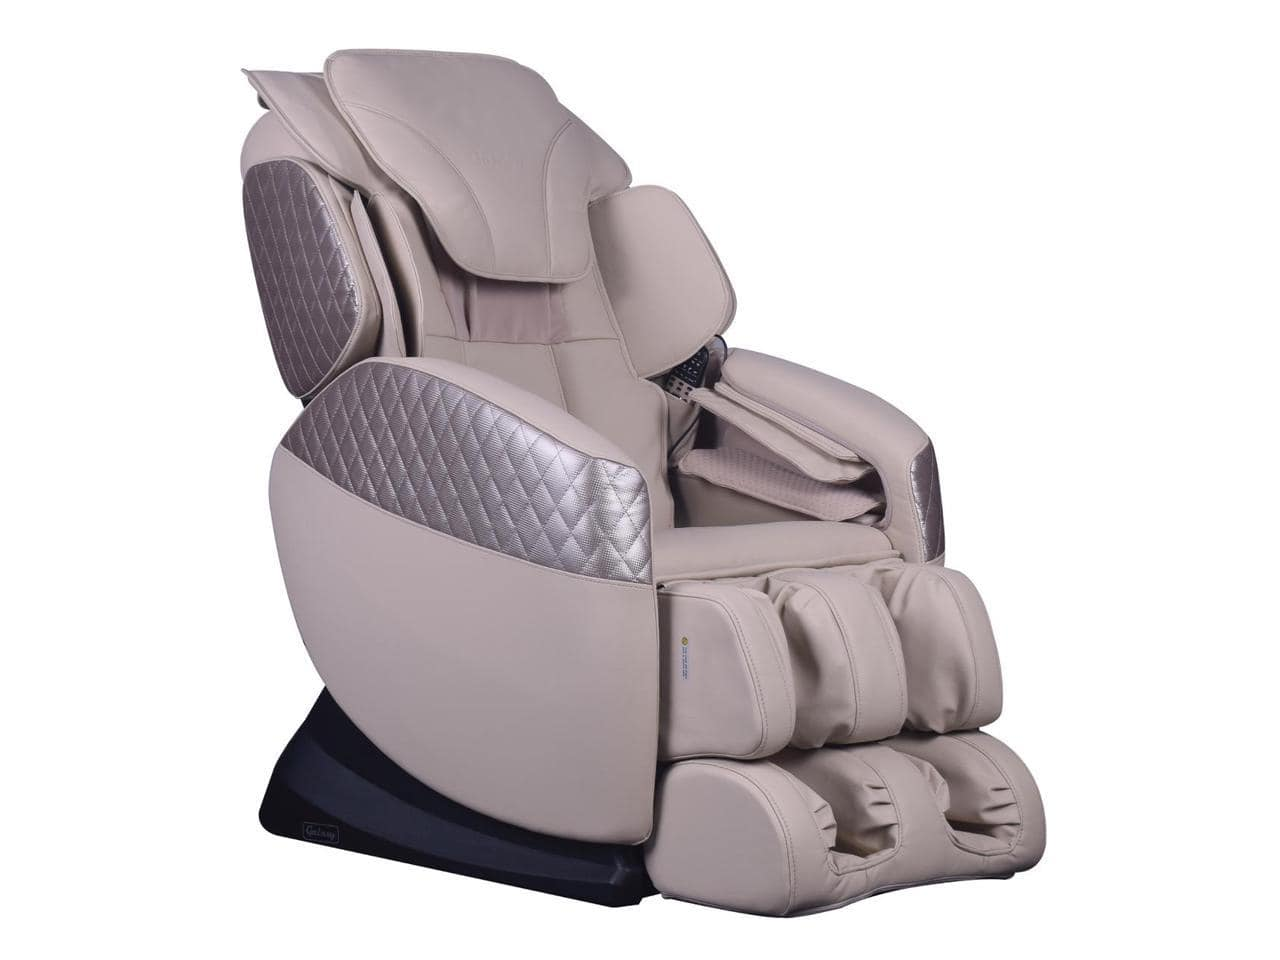 Titan Chair Osaki Galaxy EC555 Massage Chair - $880 + Free Shipping